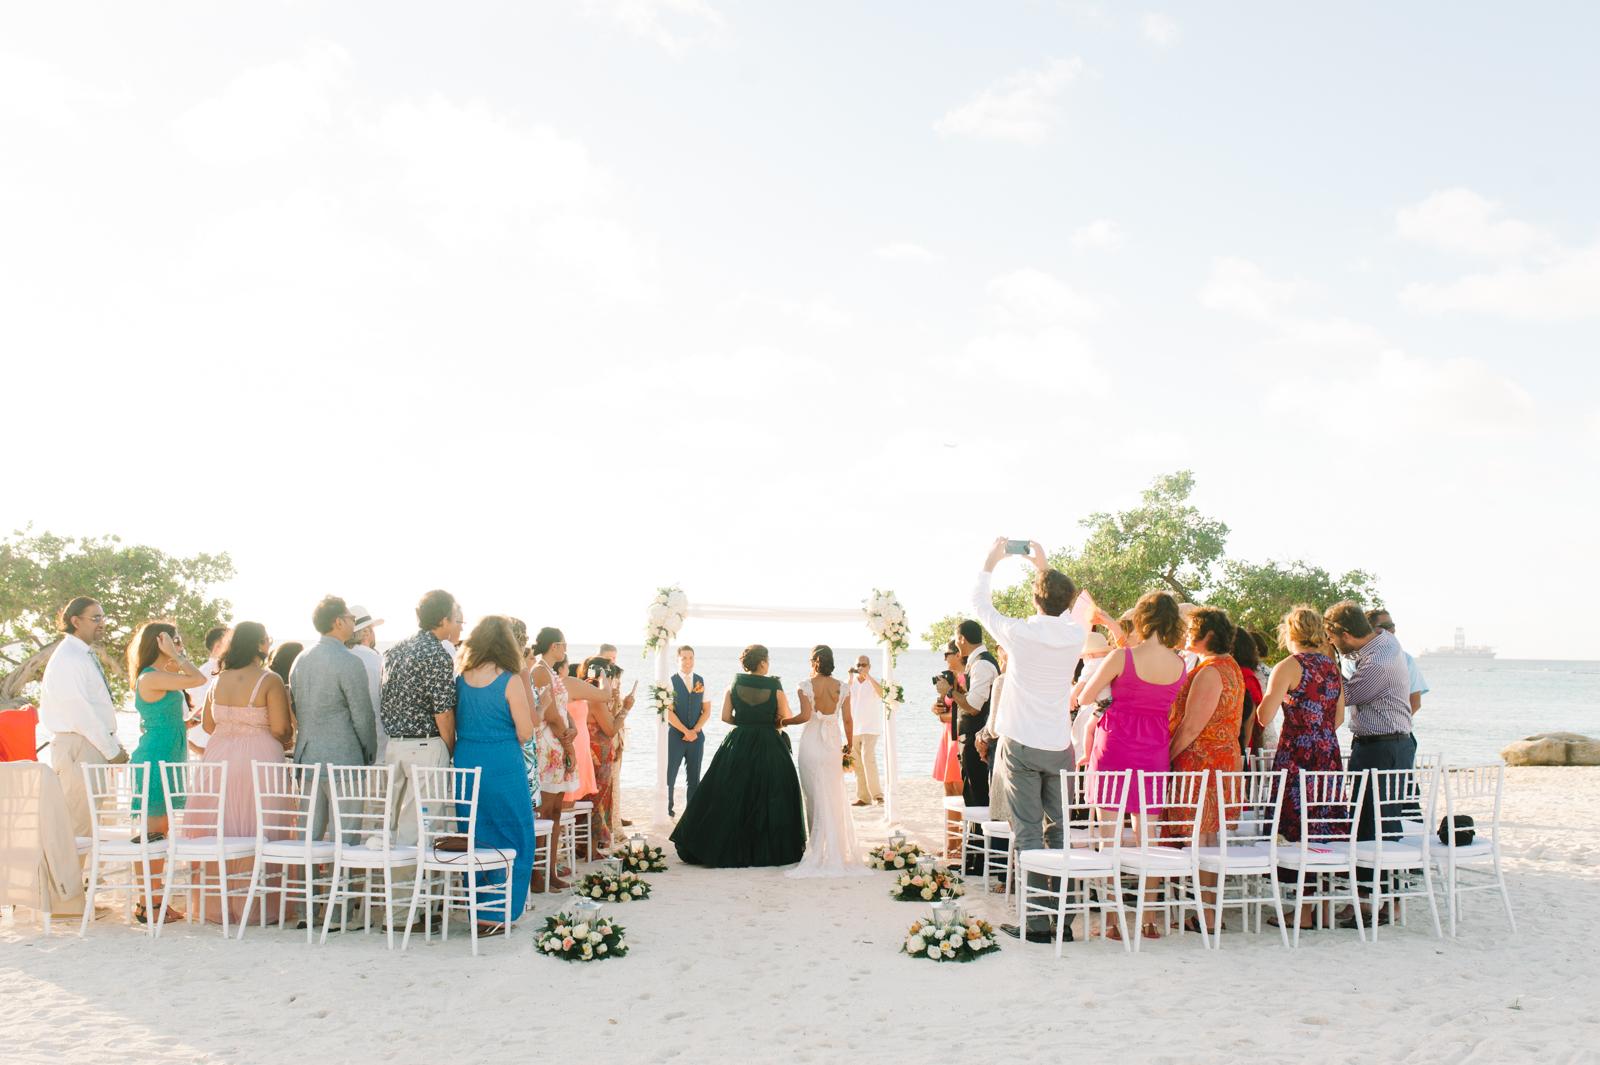 tara mcmullen photography amsterdam manor hotel wedding in aruba best wedding venue in aruba destination wedding photographer aruba indian wedding in aruba-019